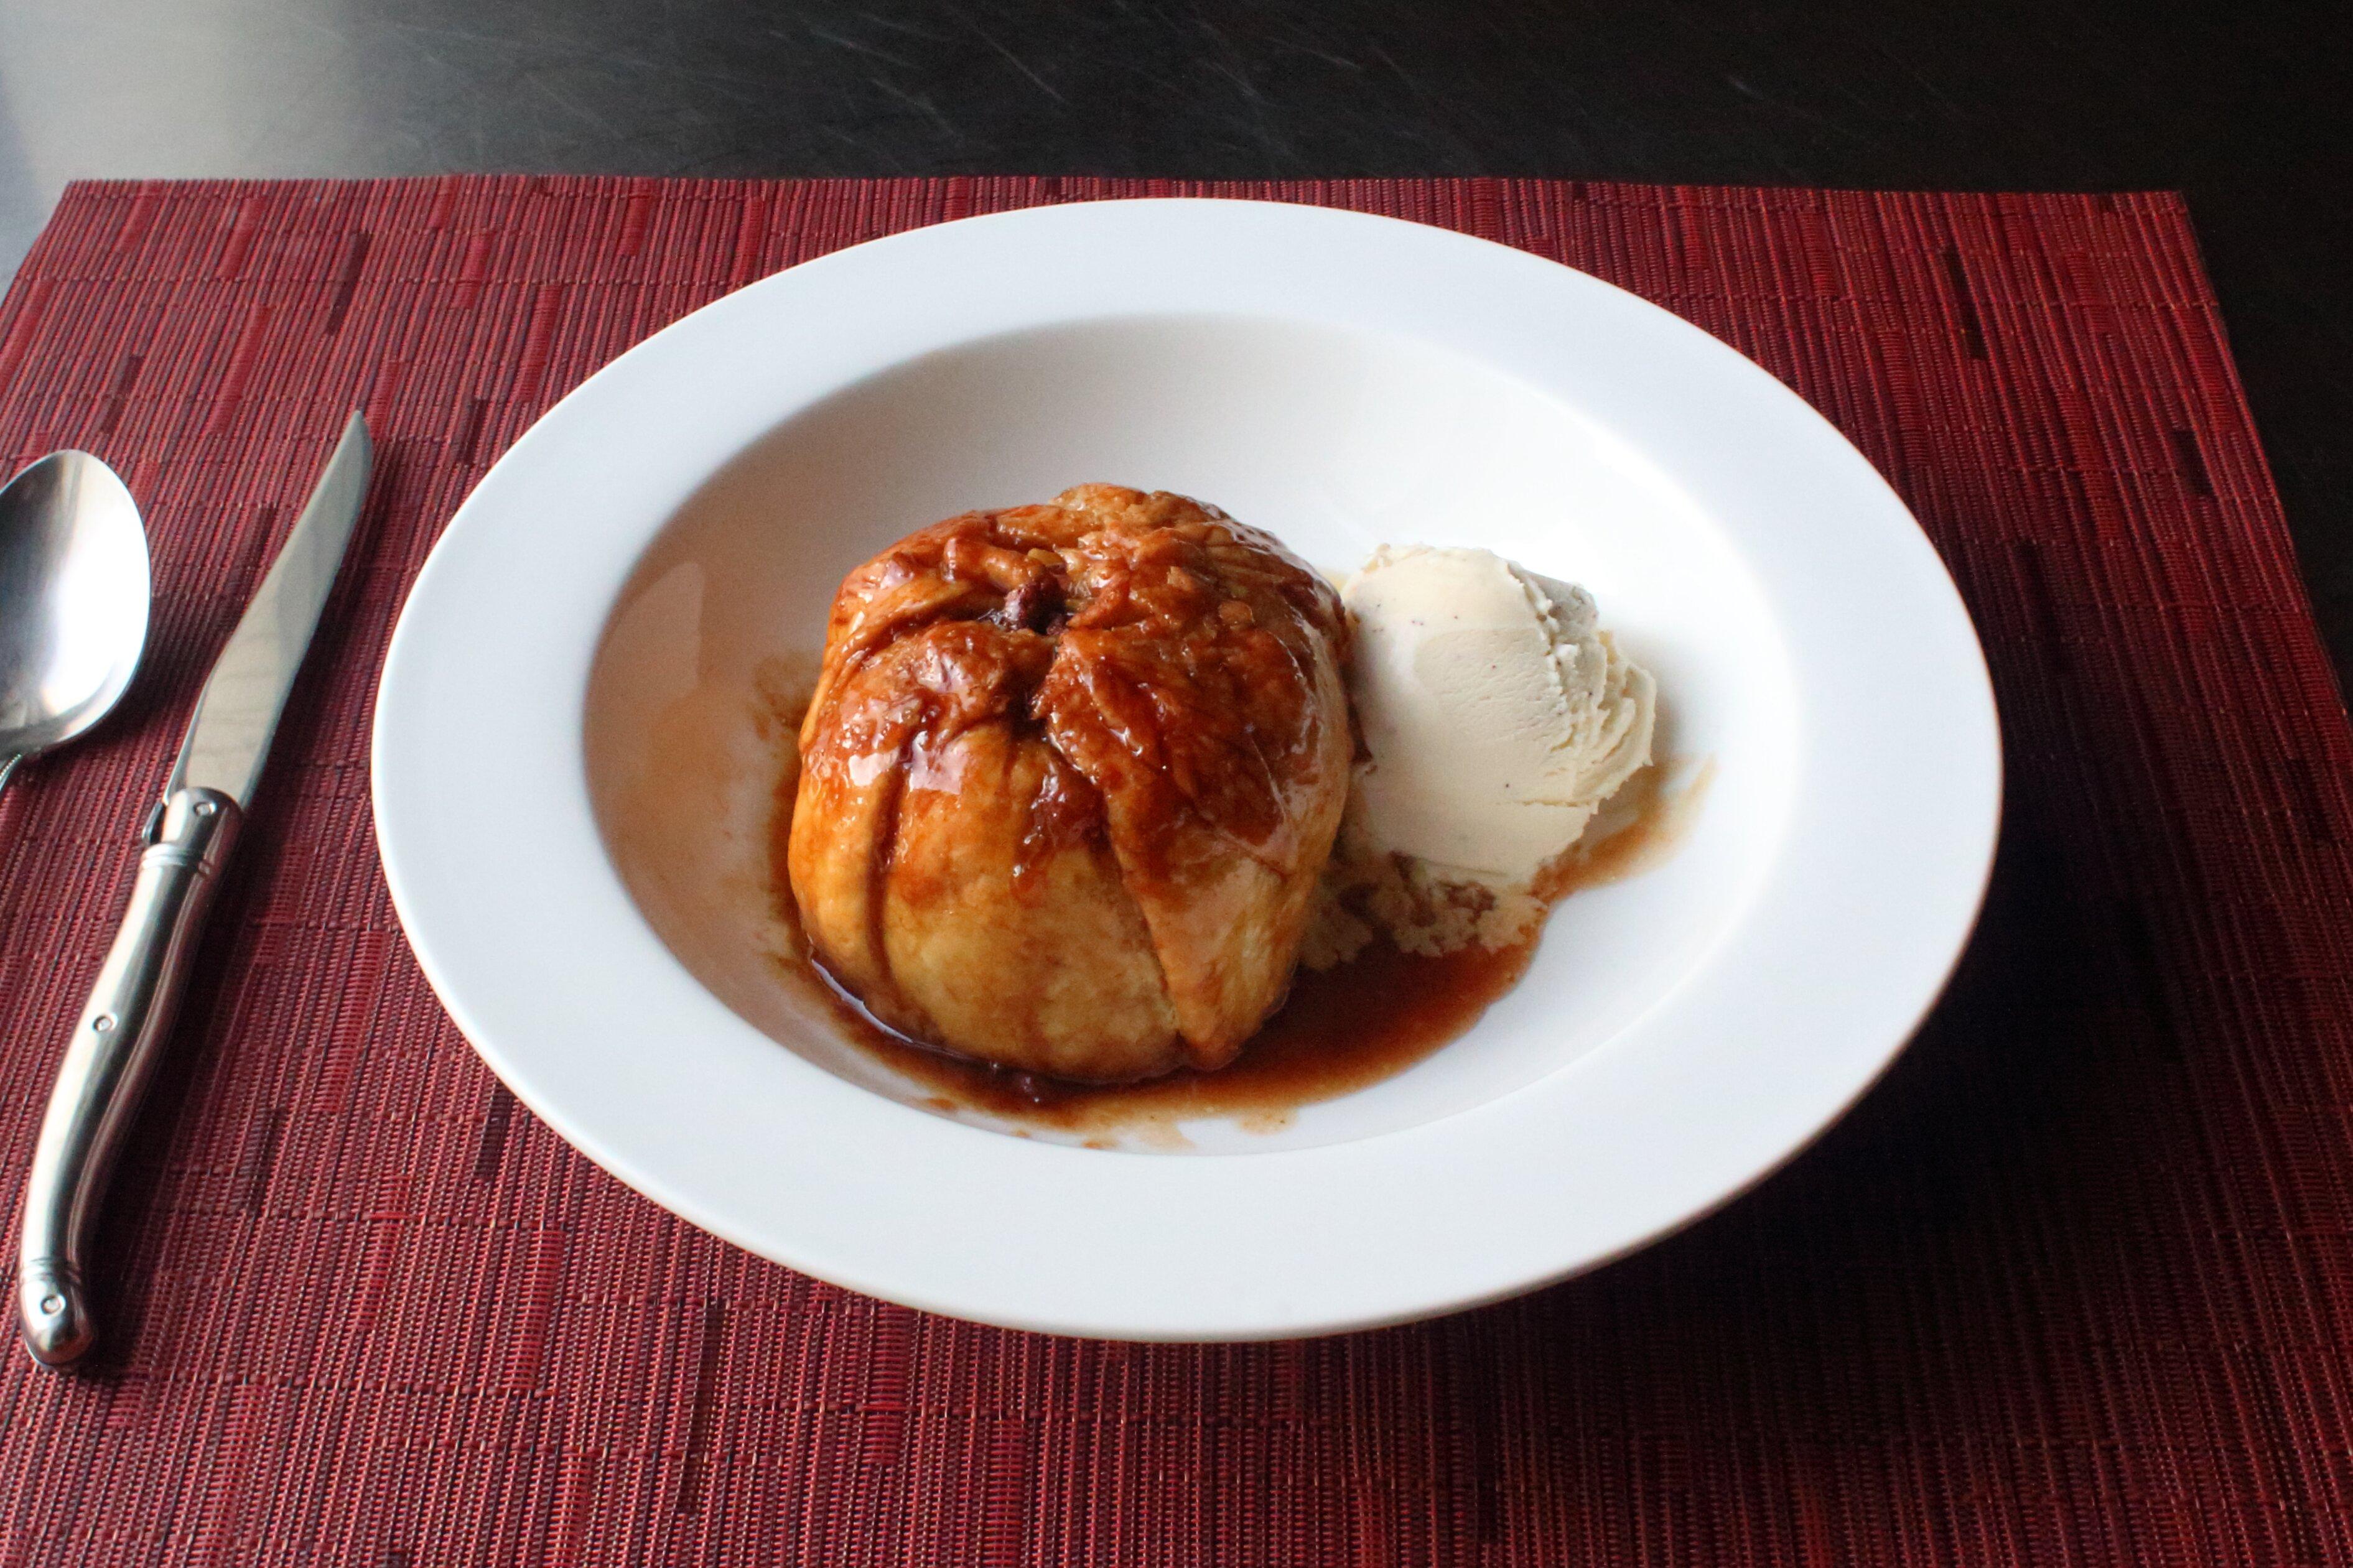 chef johns apple dumplings